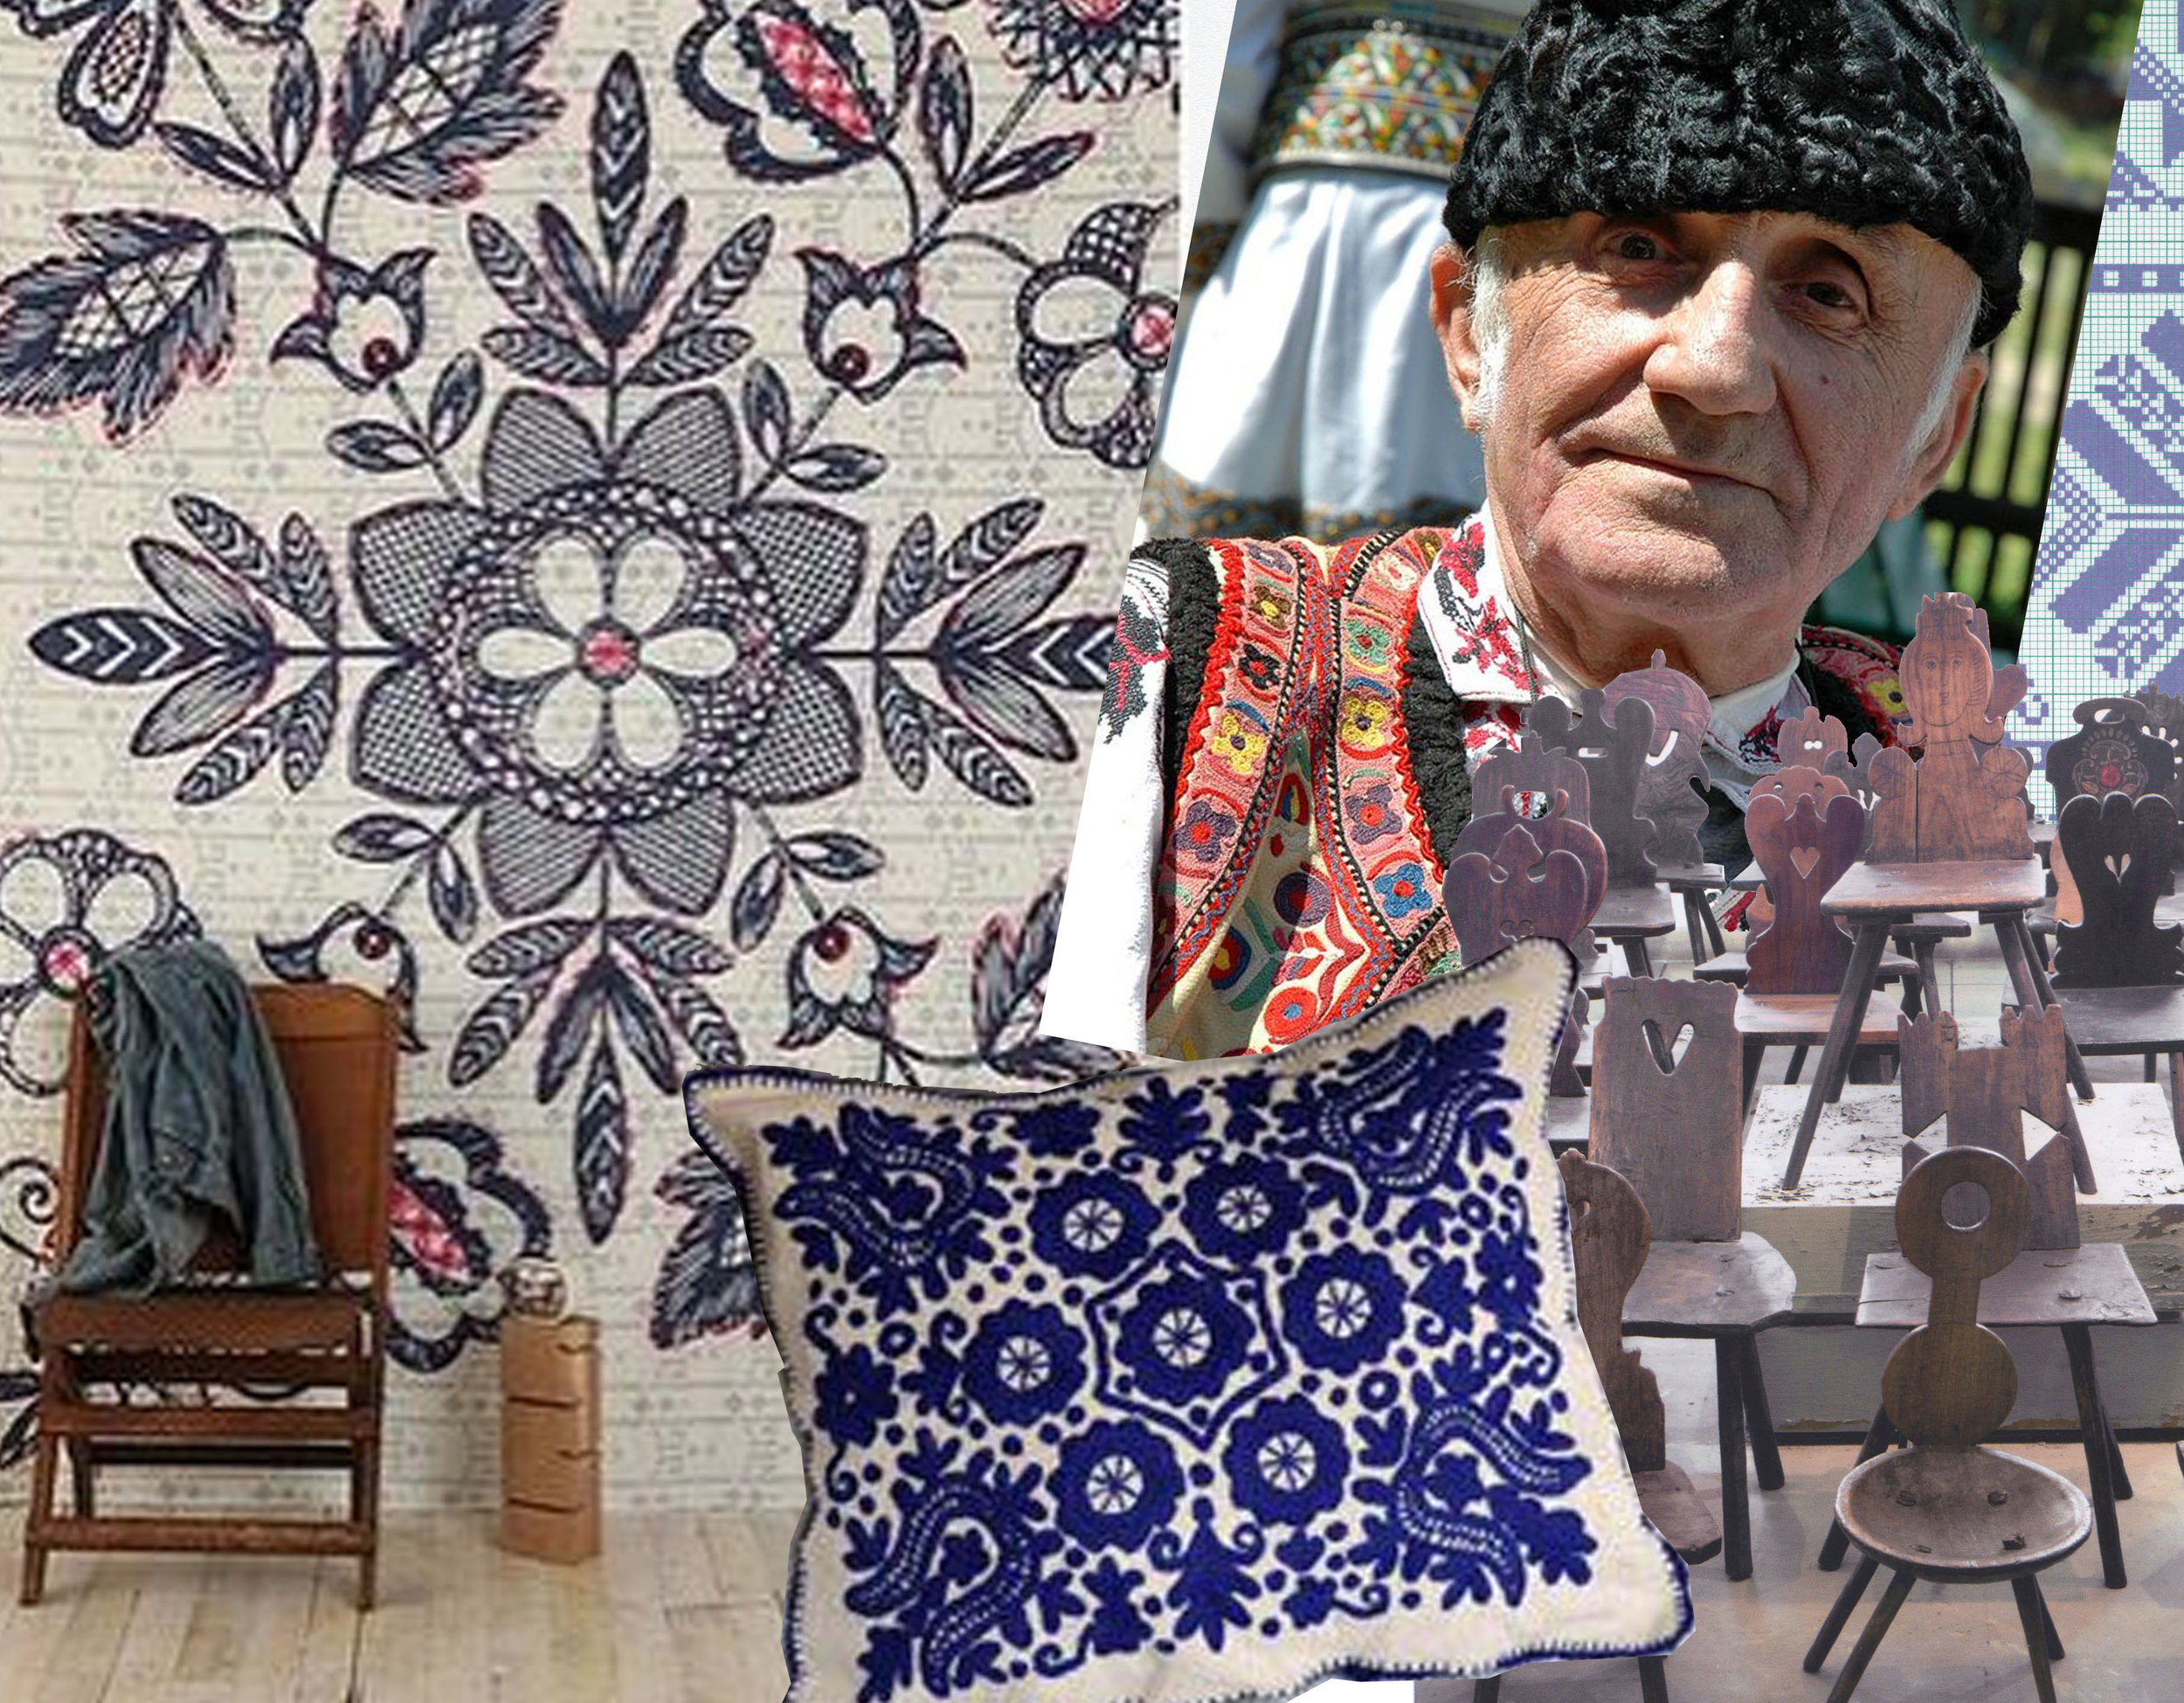 mural - image old man via  Flickr  - wooden chairs  Muzeul Taranului Roman